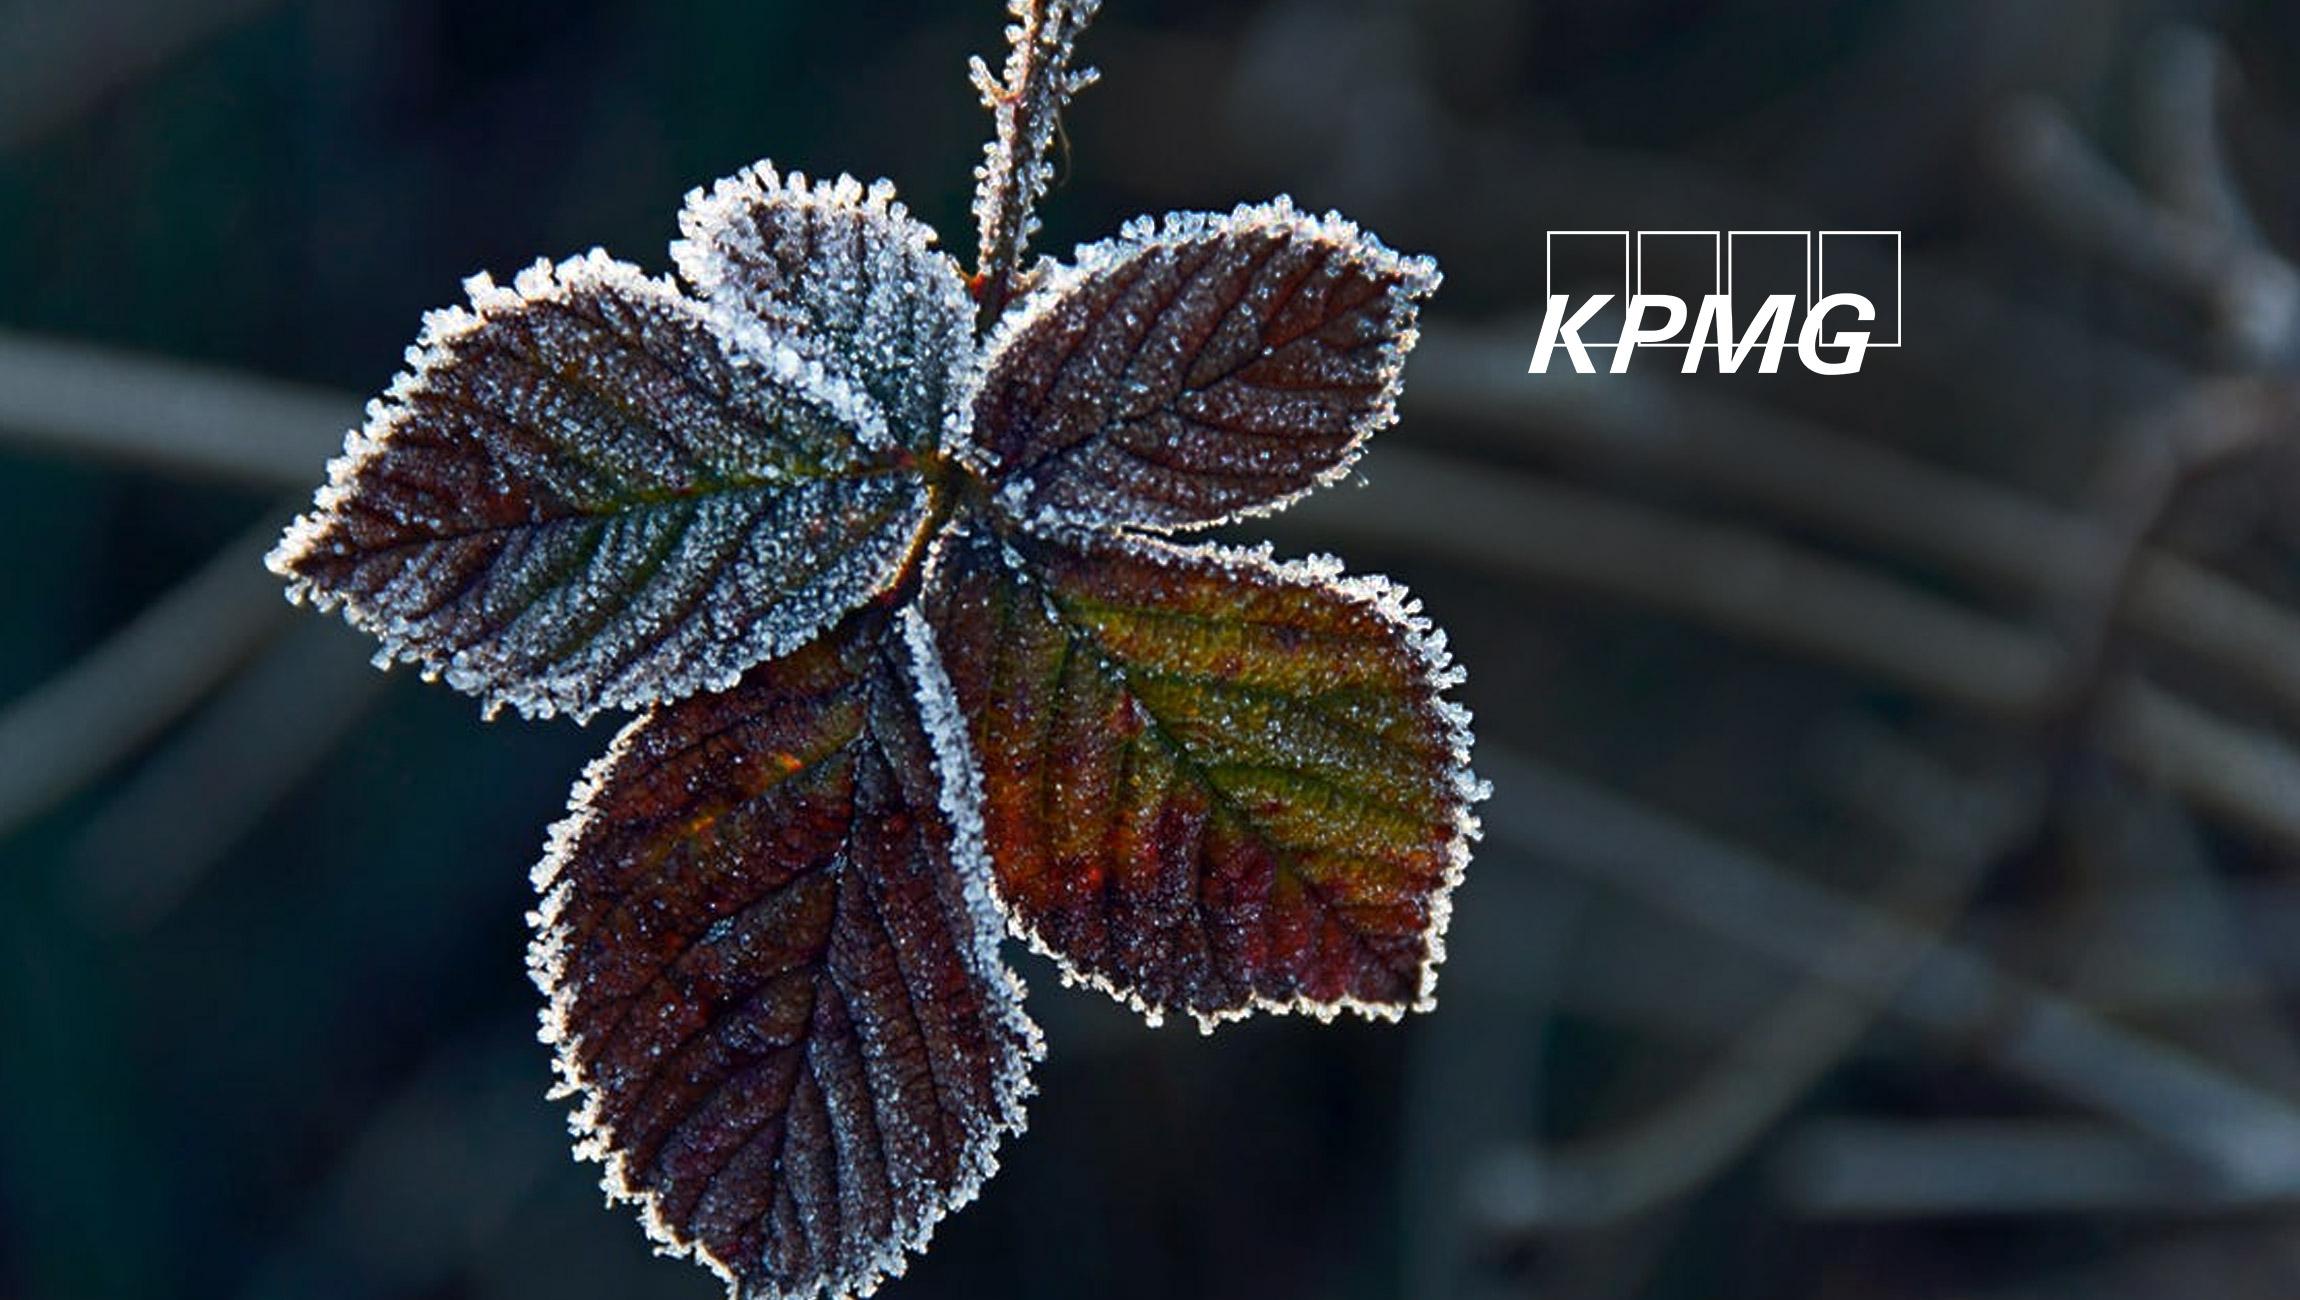 KPMG Announces New Integration With Google Cloud Contact Center